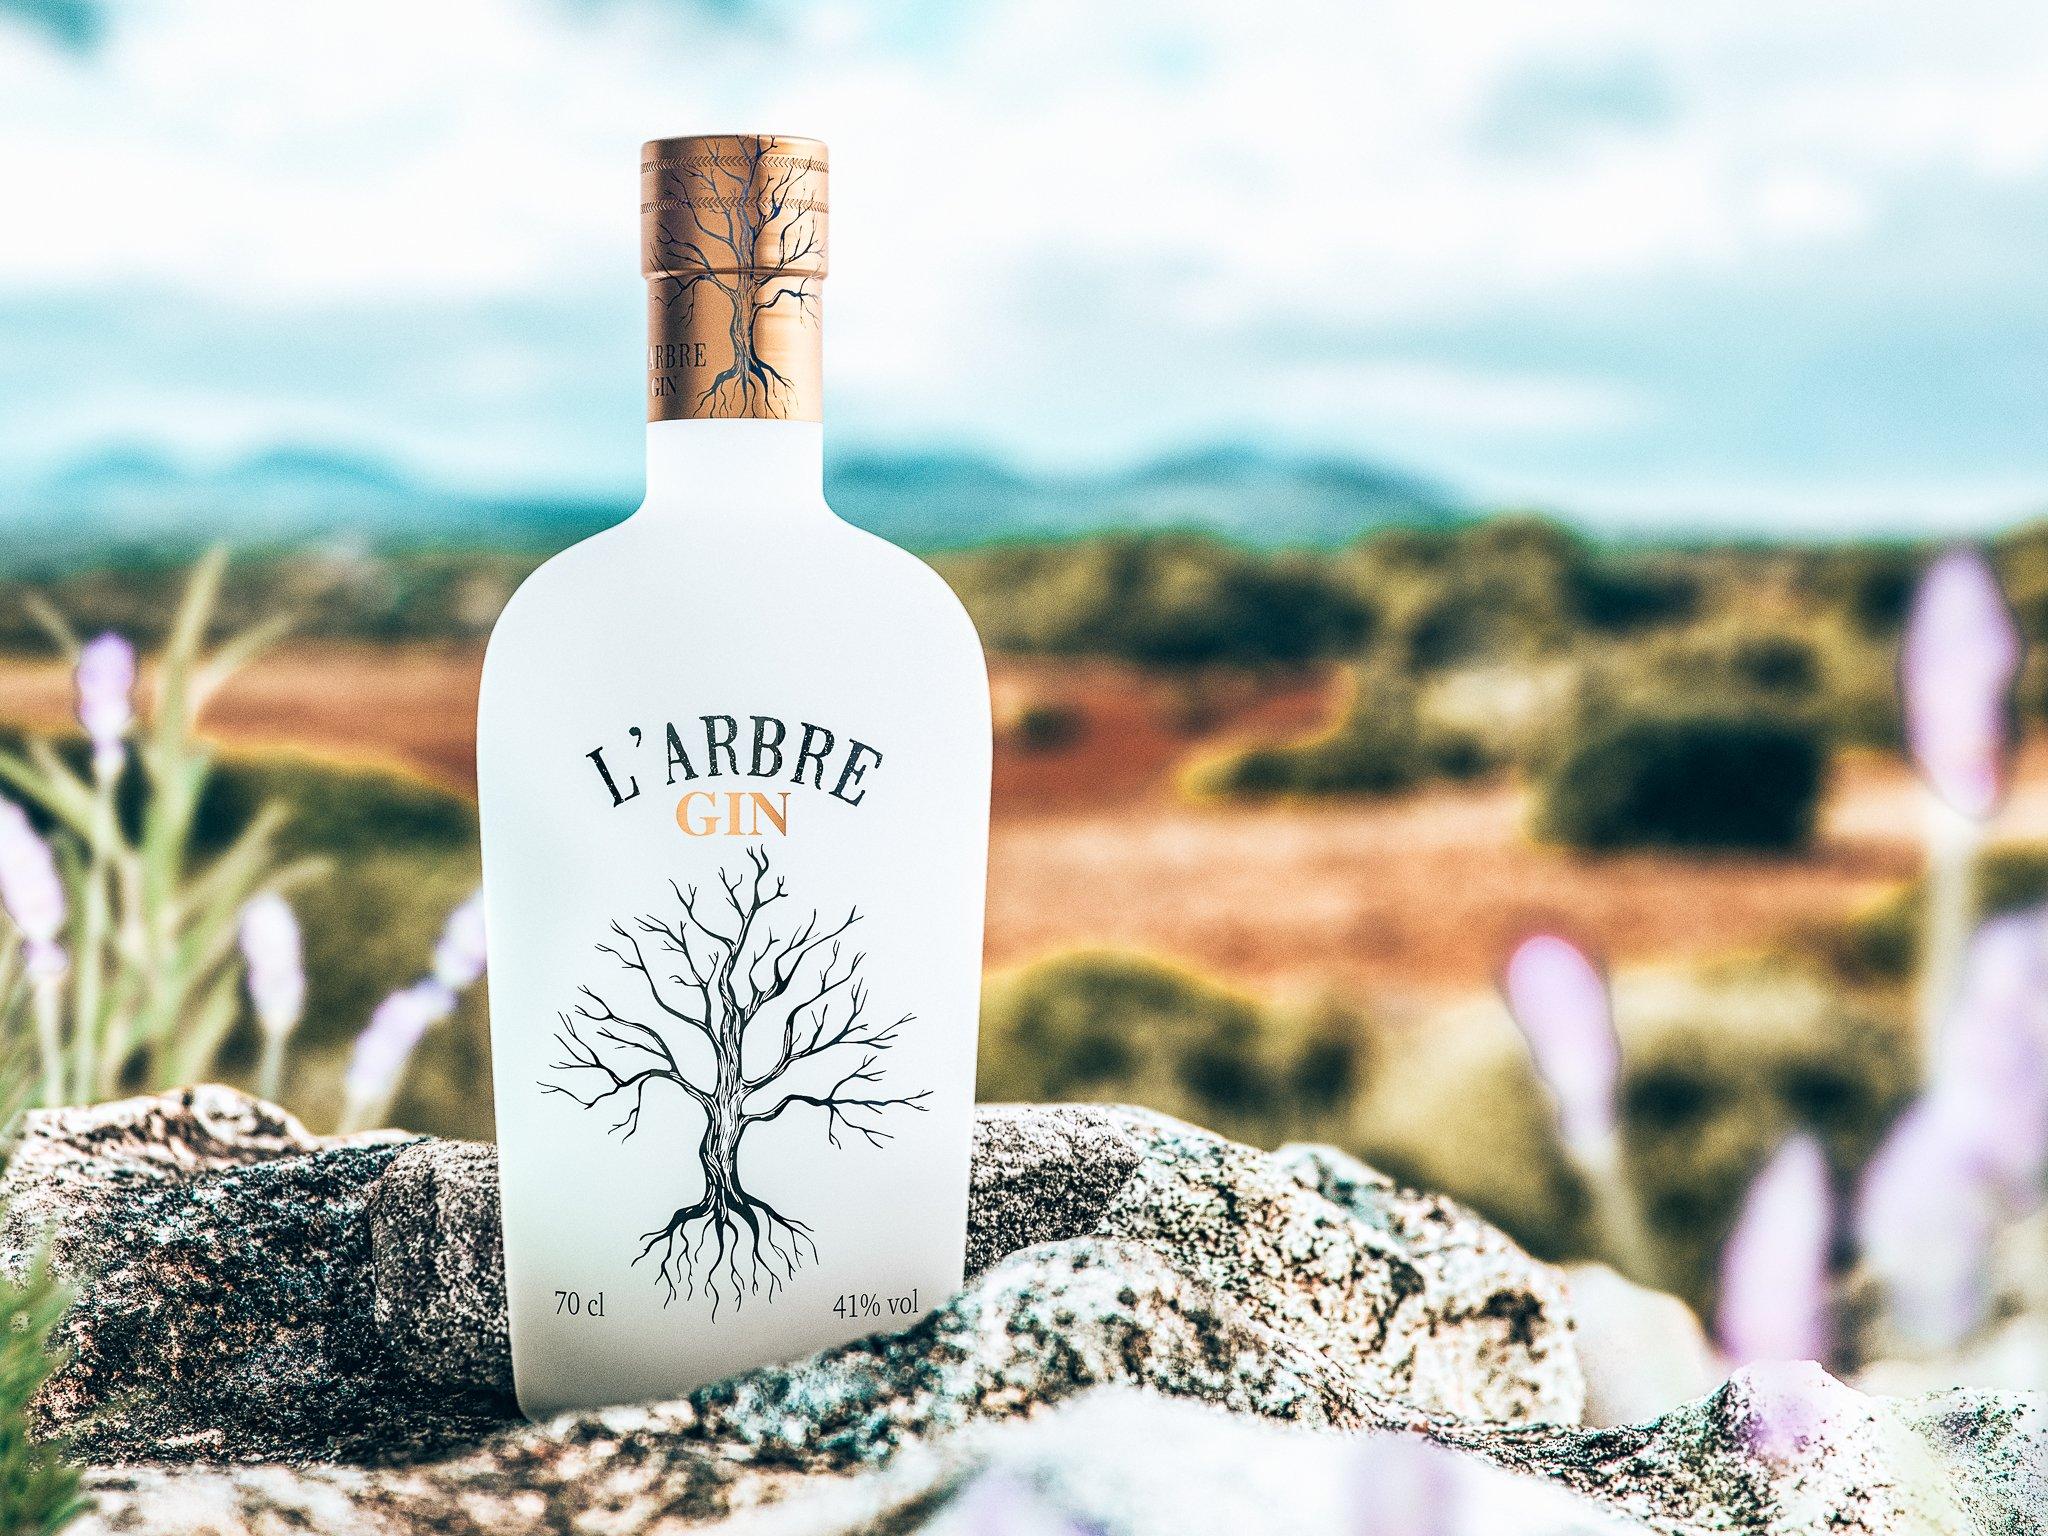 Het verhaal achter L'Arbre Gin, Teichenné Liquors, Alles over gin.